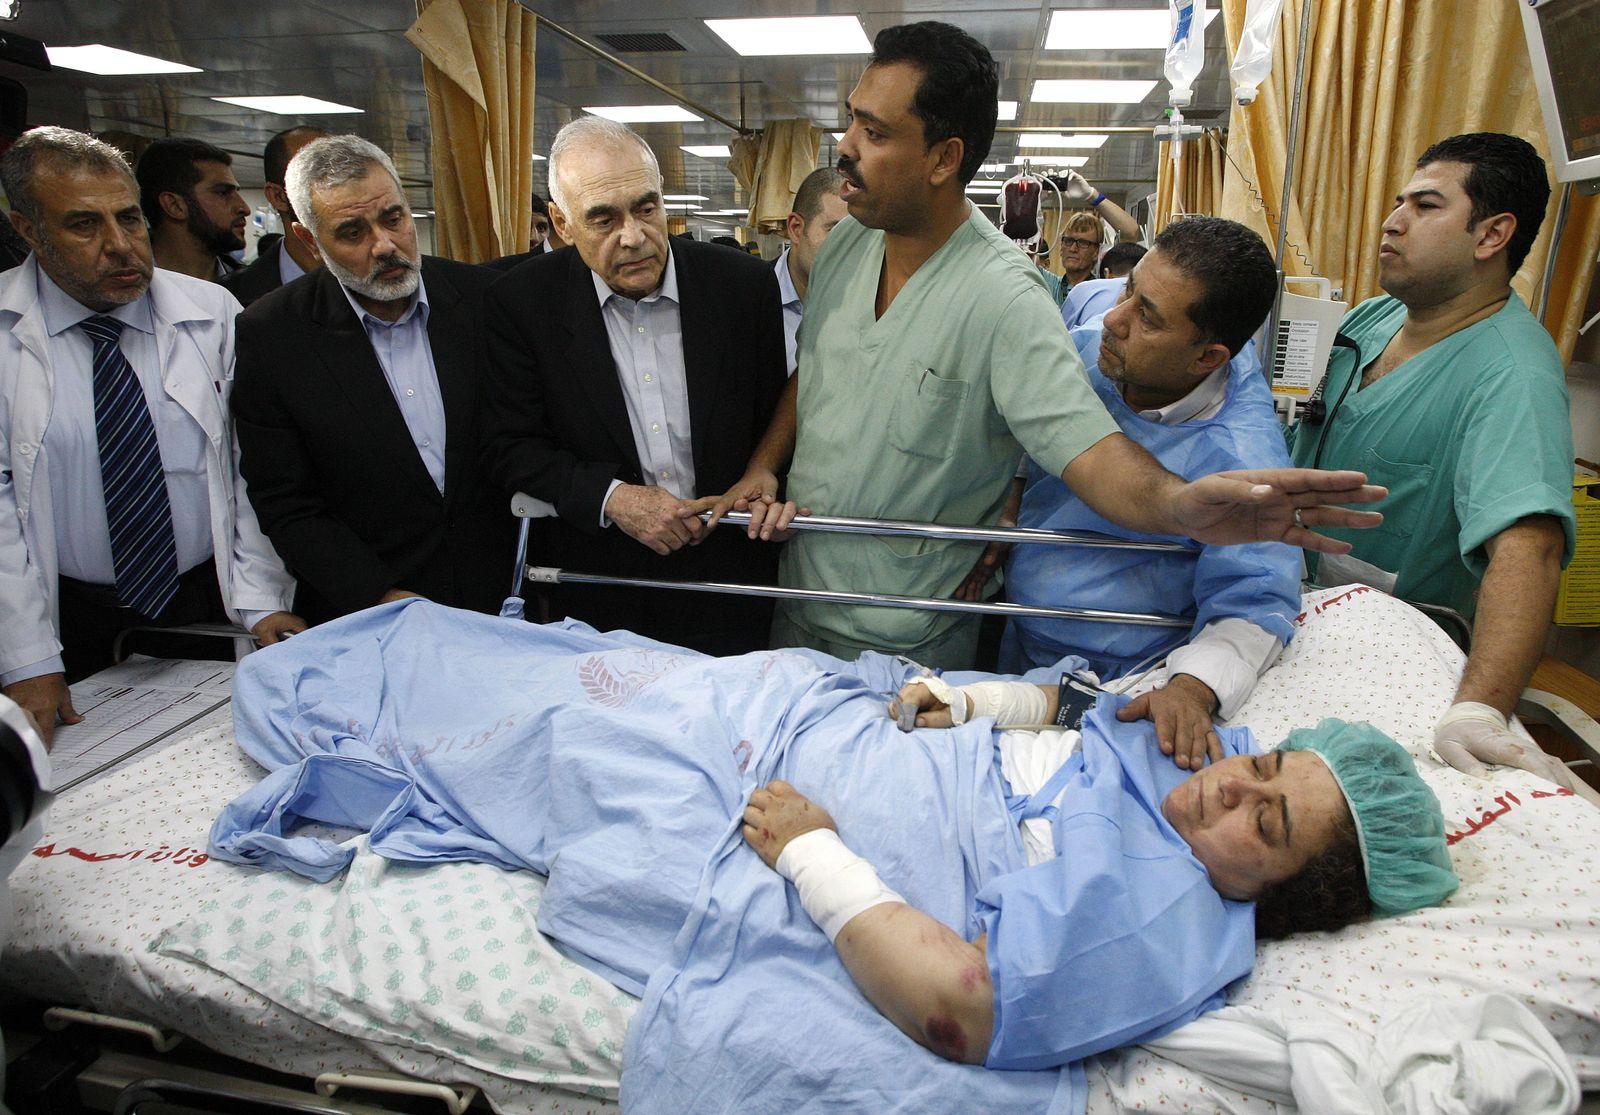 Gaza / Krankenhaus